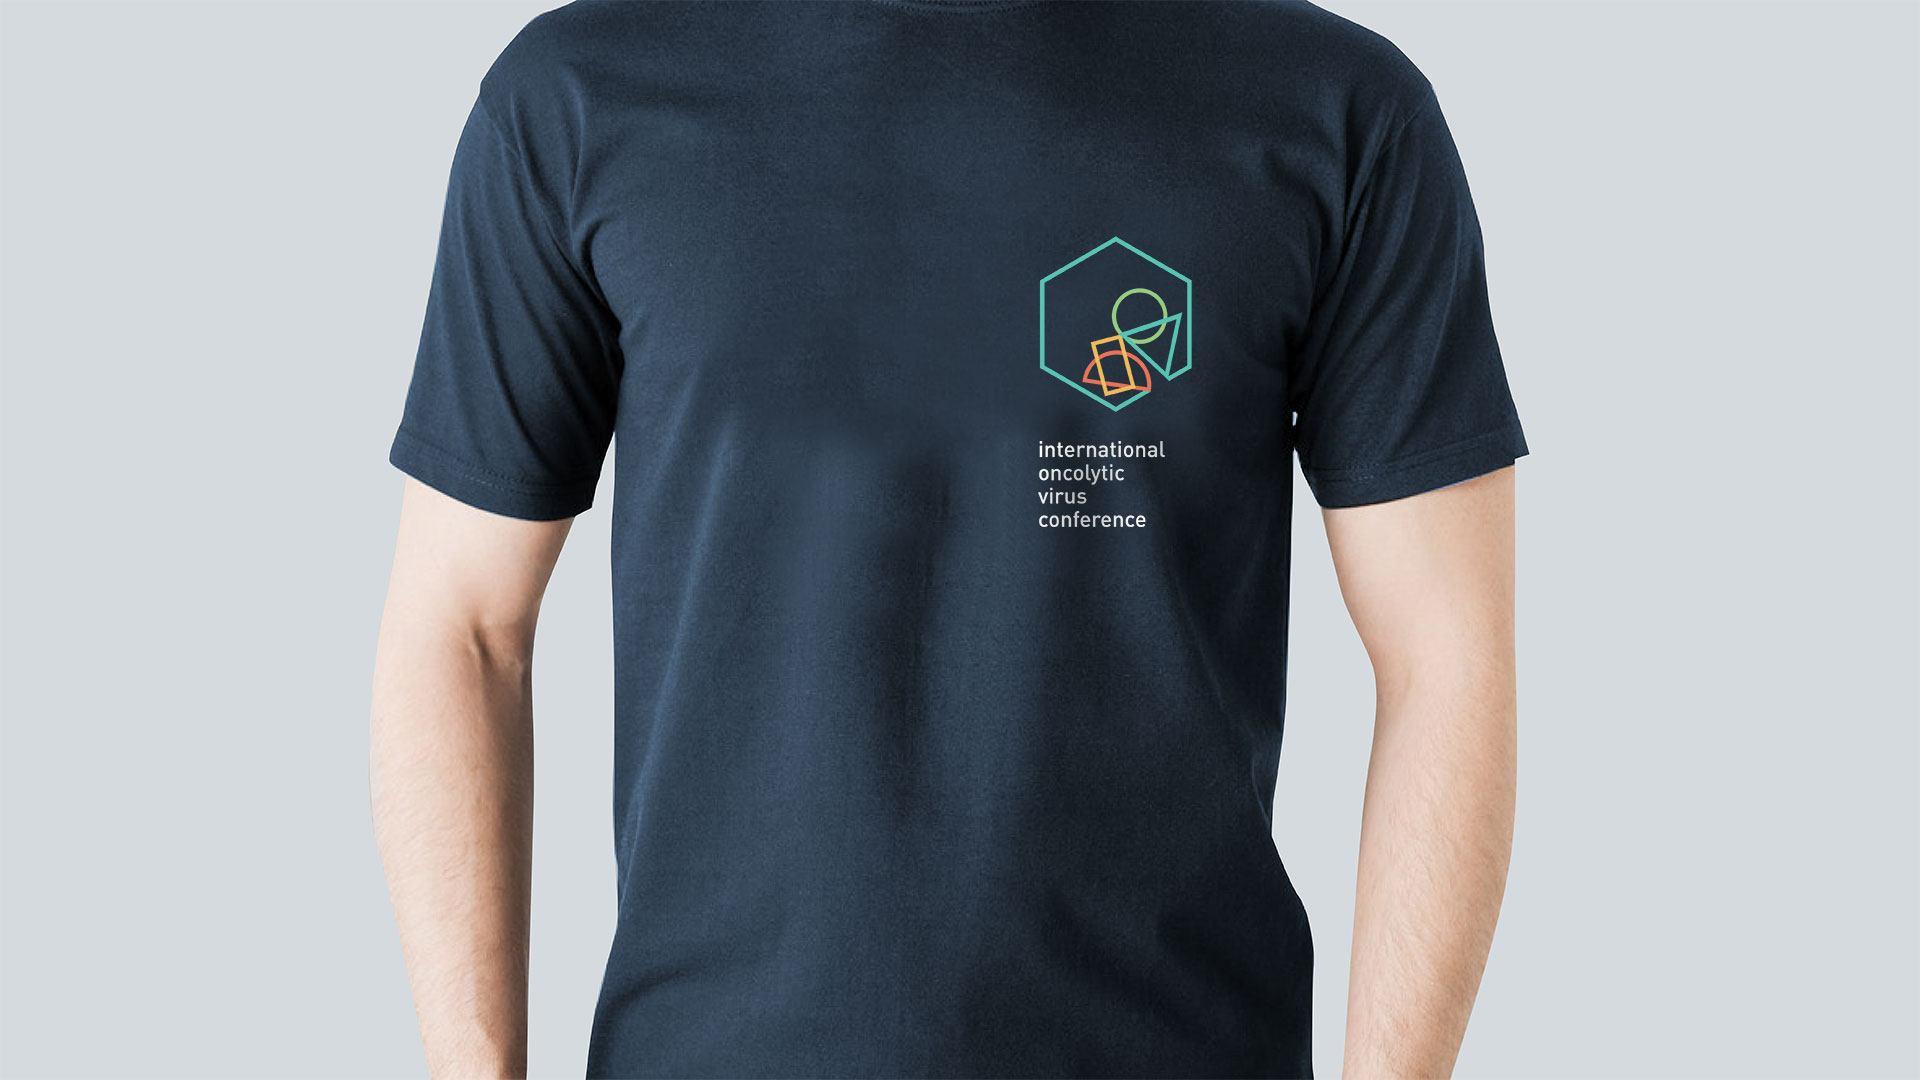 International Oncolytic Virus Conference T-shirt logo